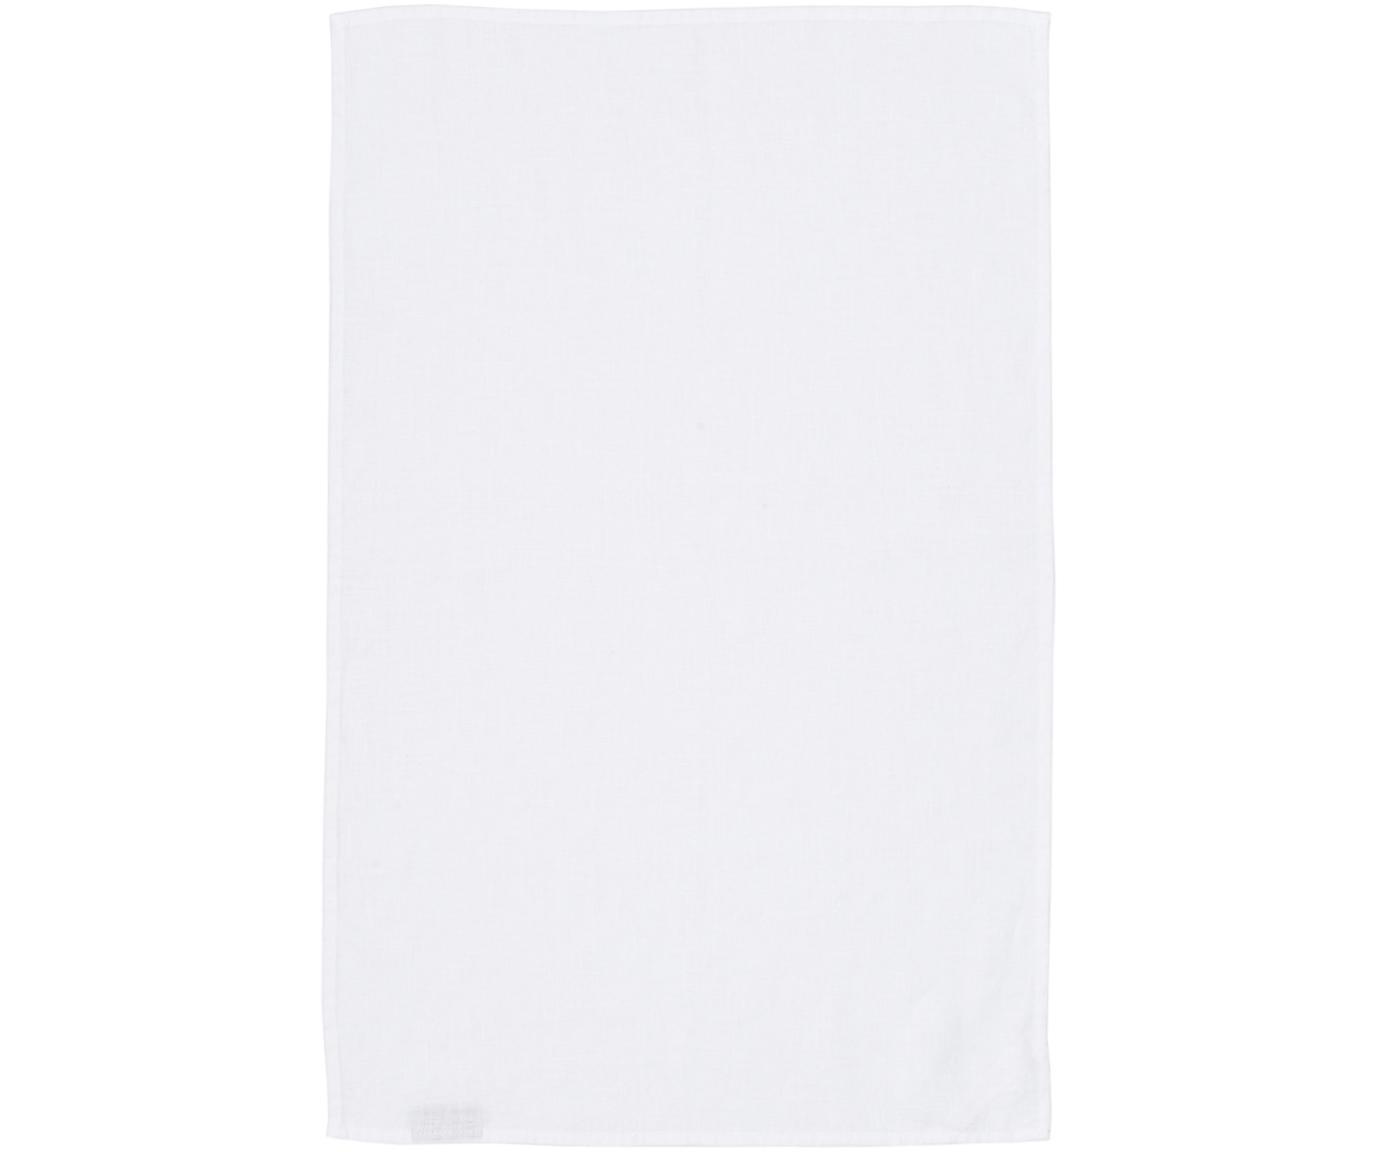 Linnen theedoek Ruta in wit, Sneeuwwit, 45 x 70 cm